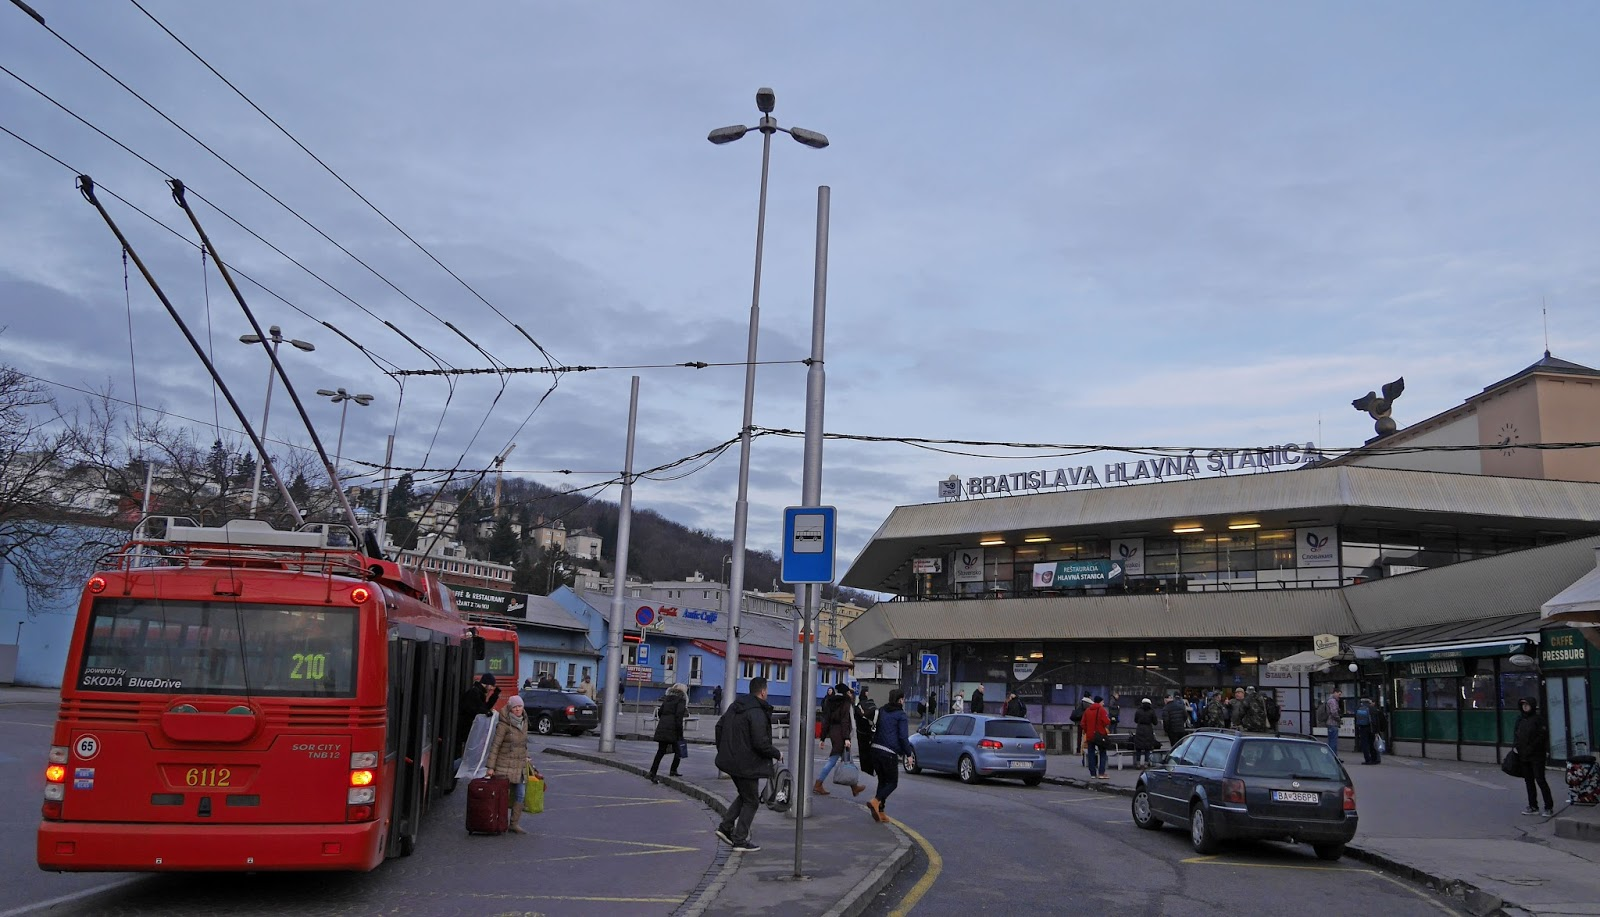 Bratislava central train station, Slovakia